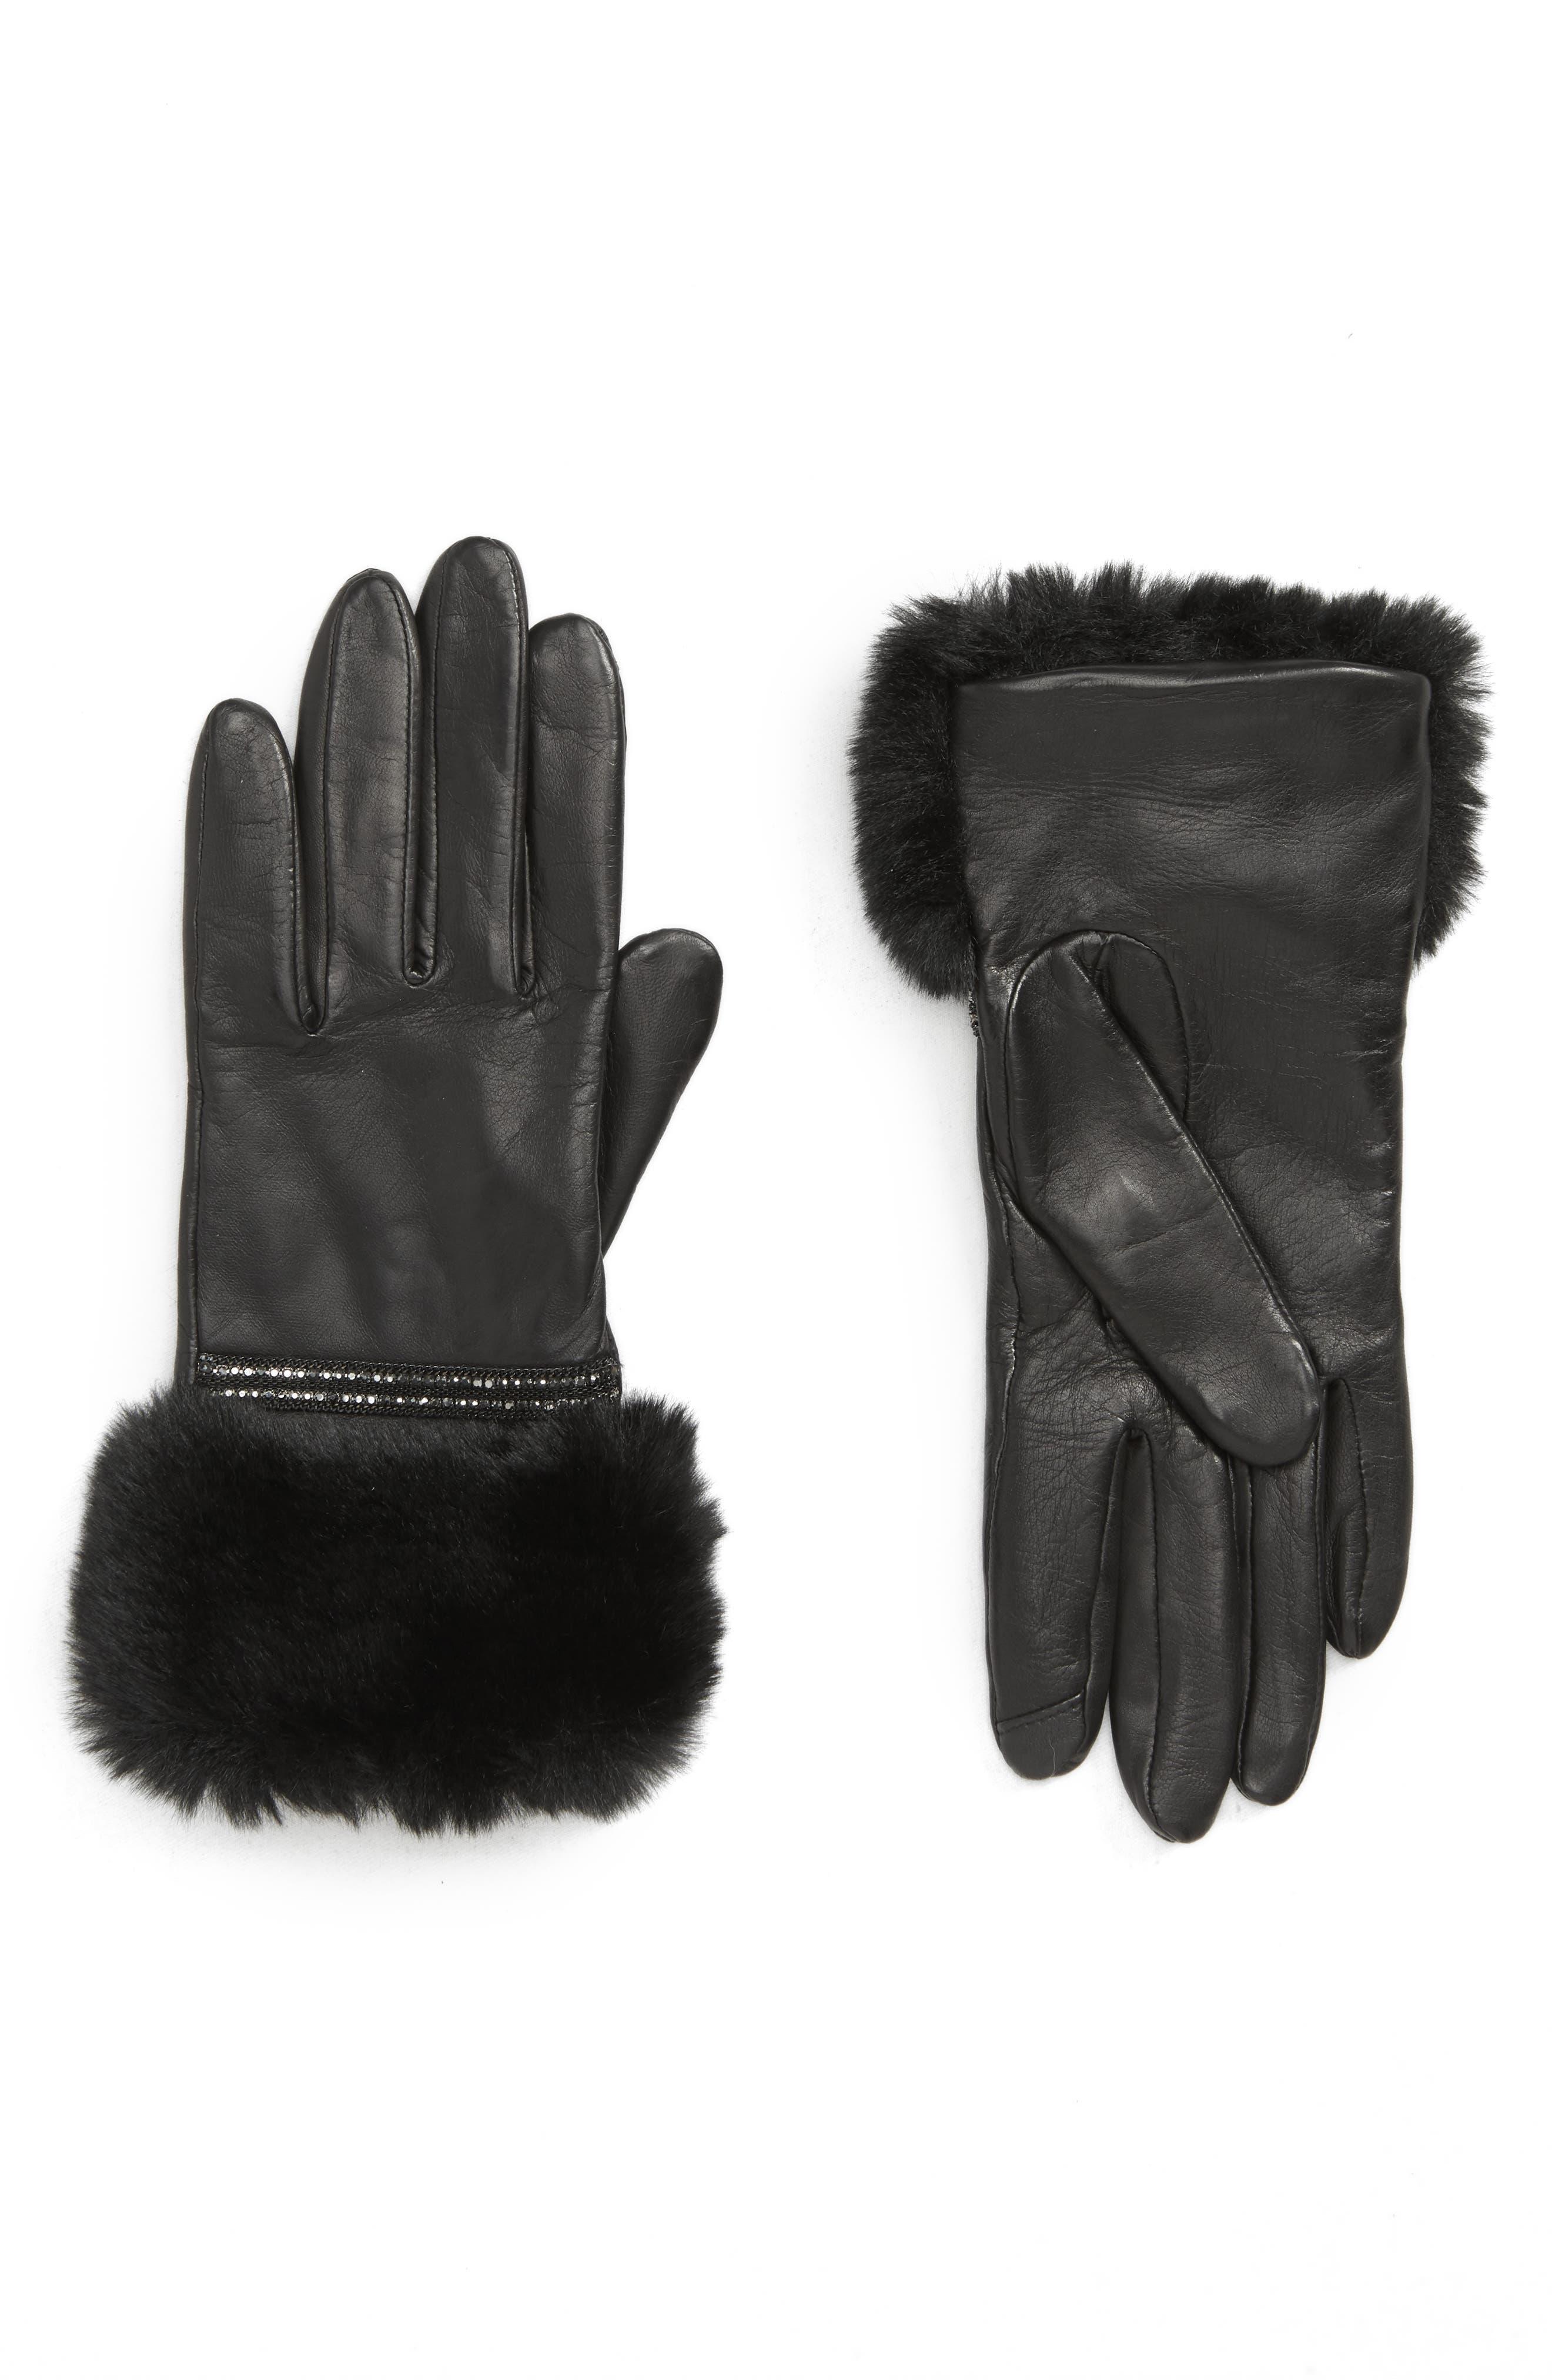 Badgley Mischka Faux Fur Trim Leather Touchscreen Gloves, Black